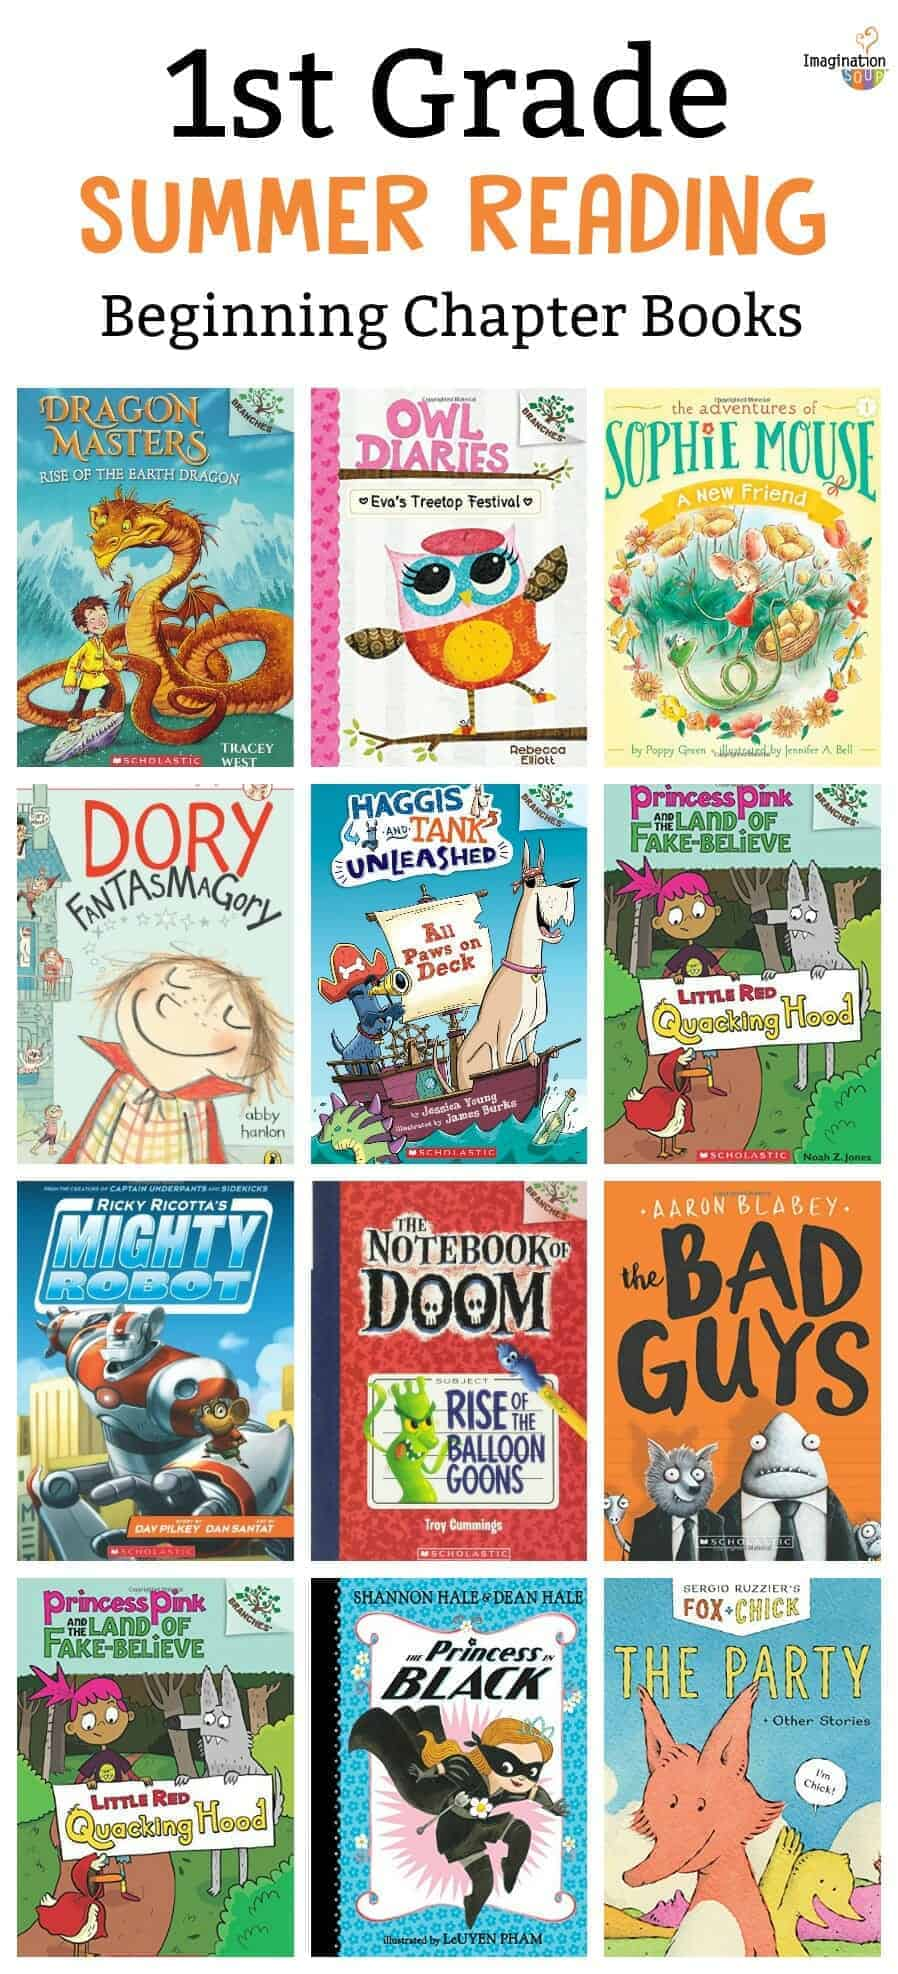 1st Grade Summer Reading List Of Books Imagination Soup